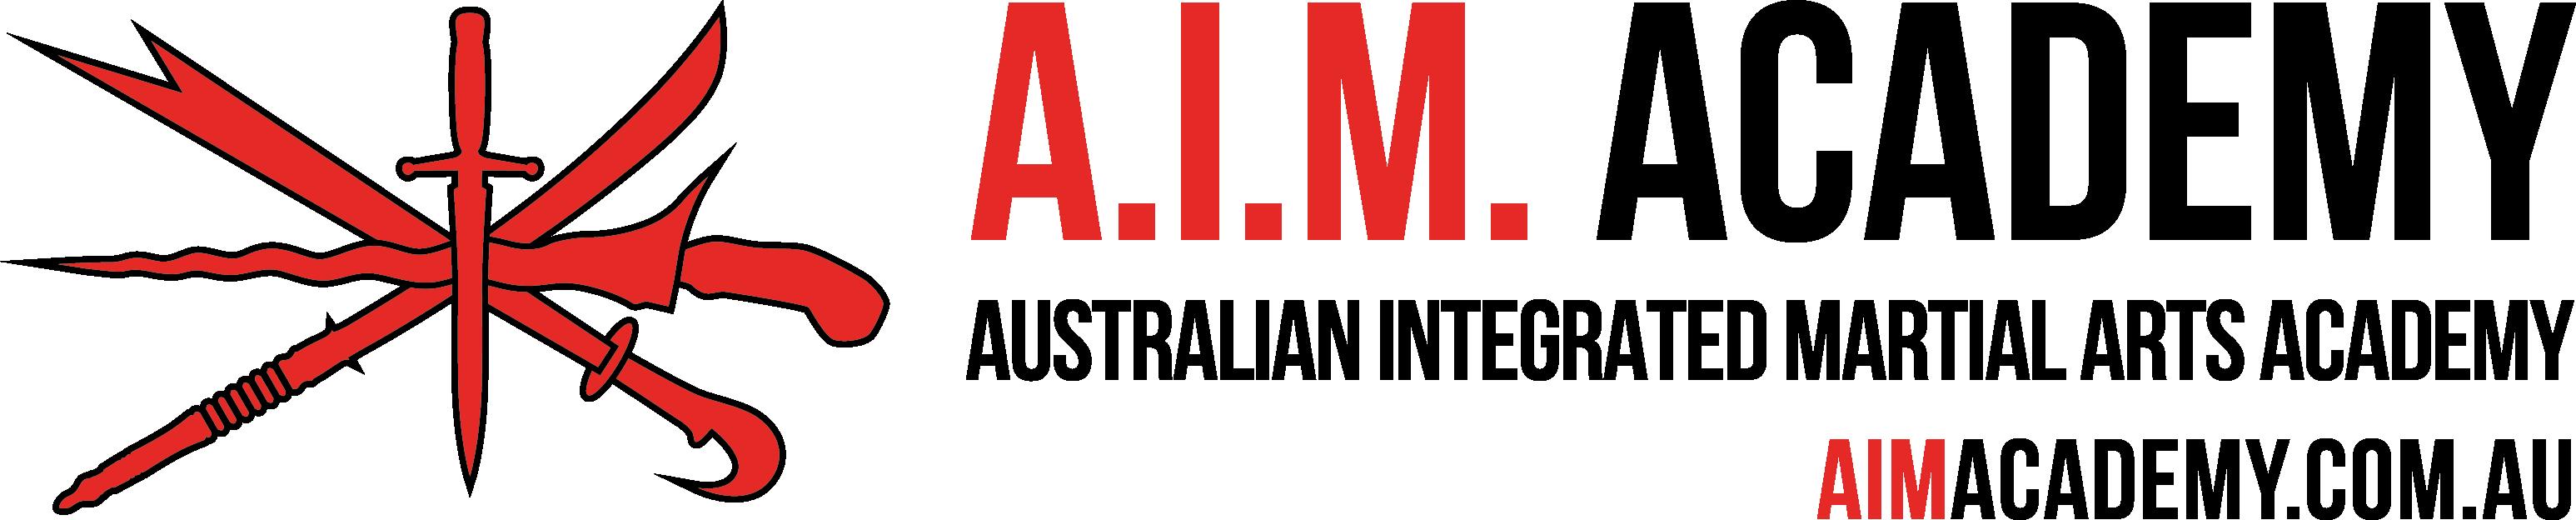 A.I.M. Academy Logo